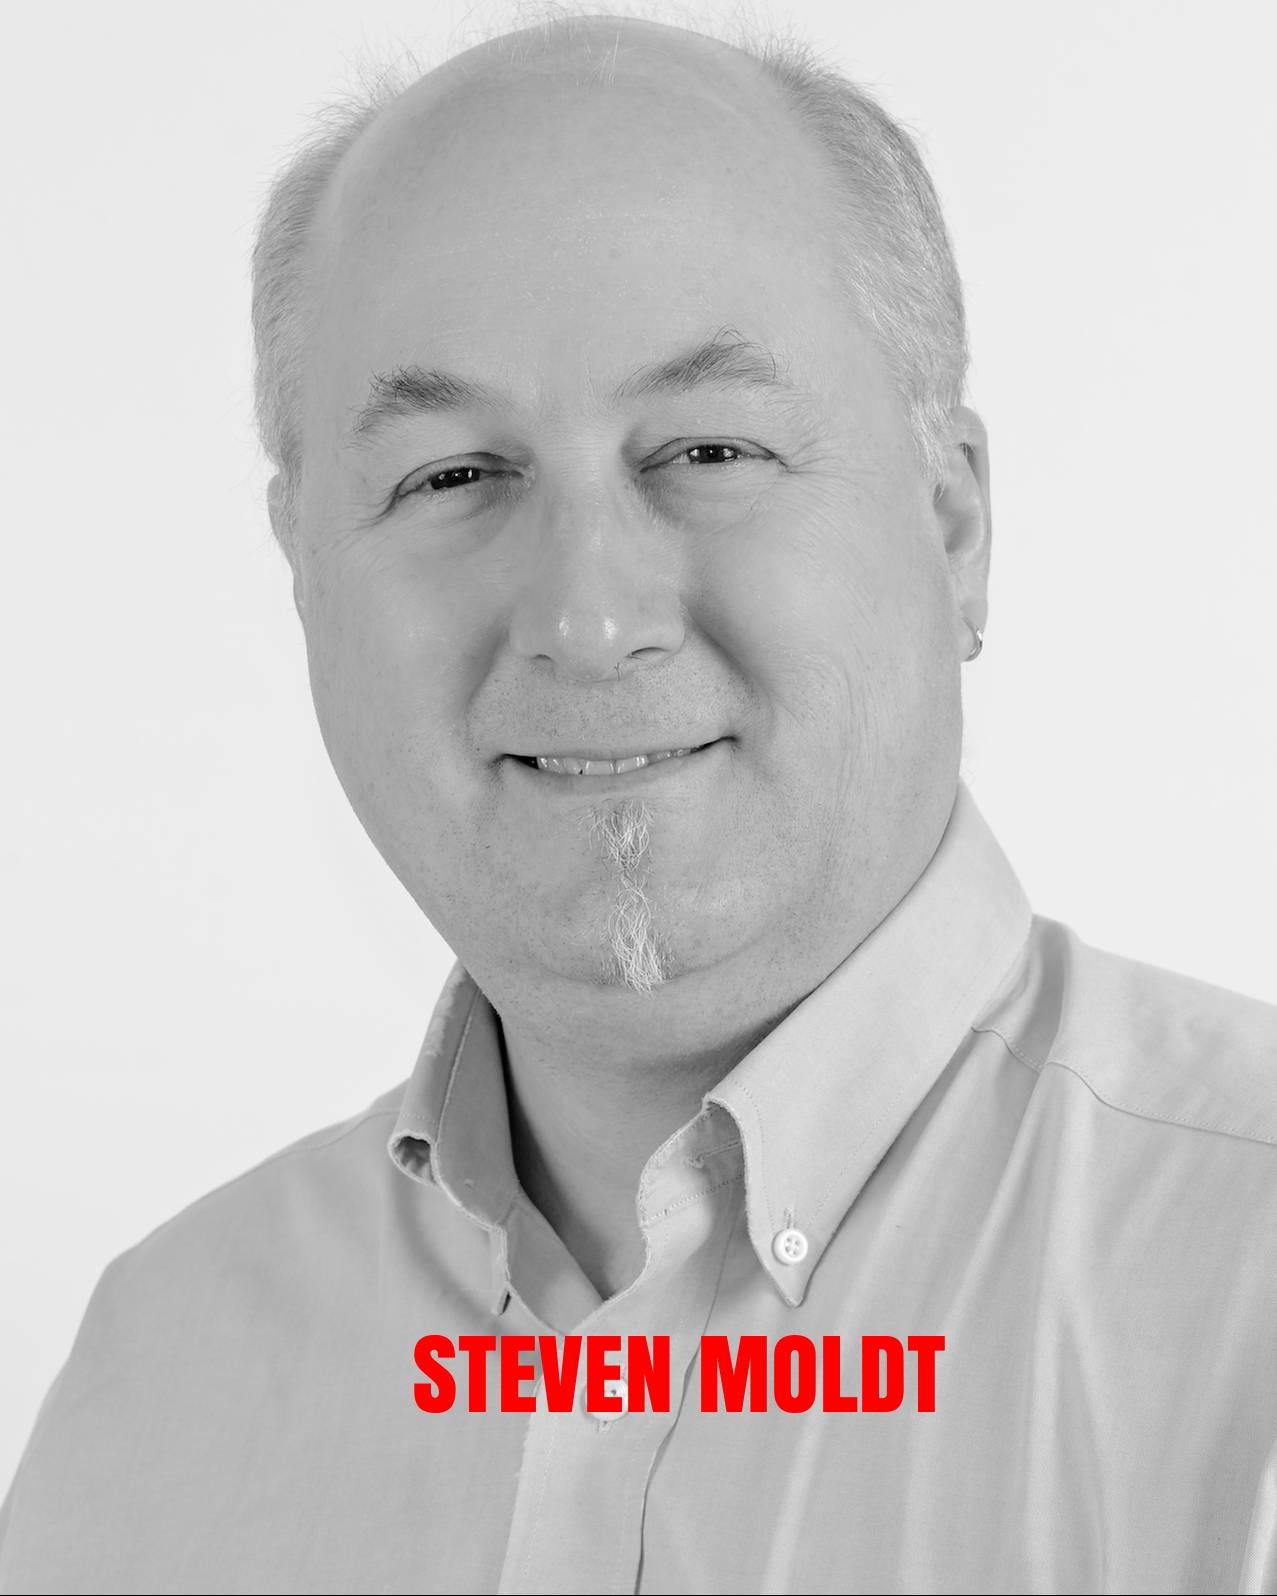 STEPHEN MOLDT